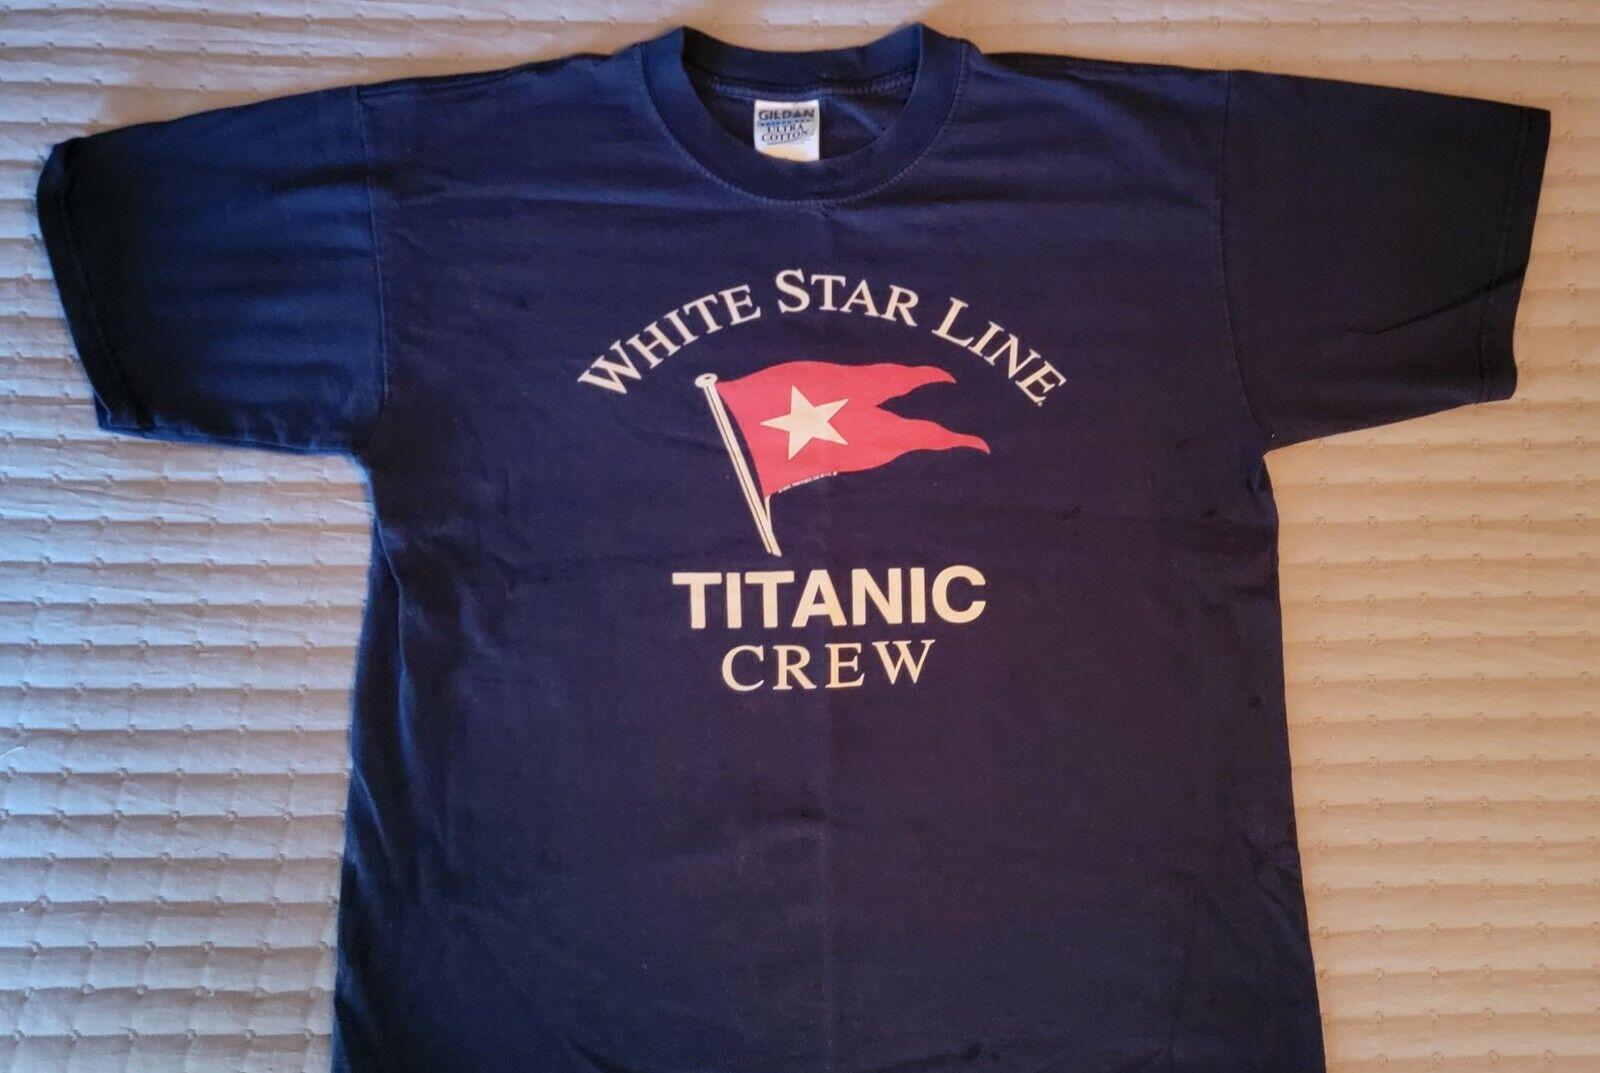 1996 RMS Titanic Crew Tshirt Large vintage